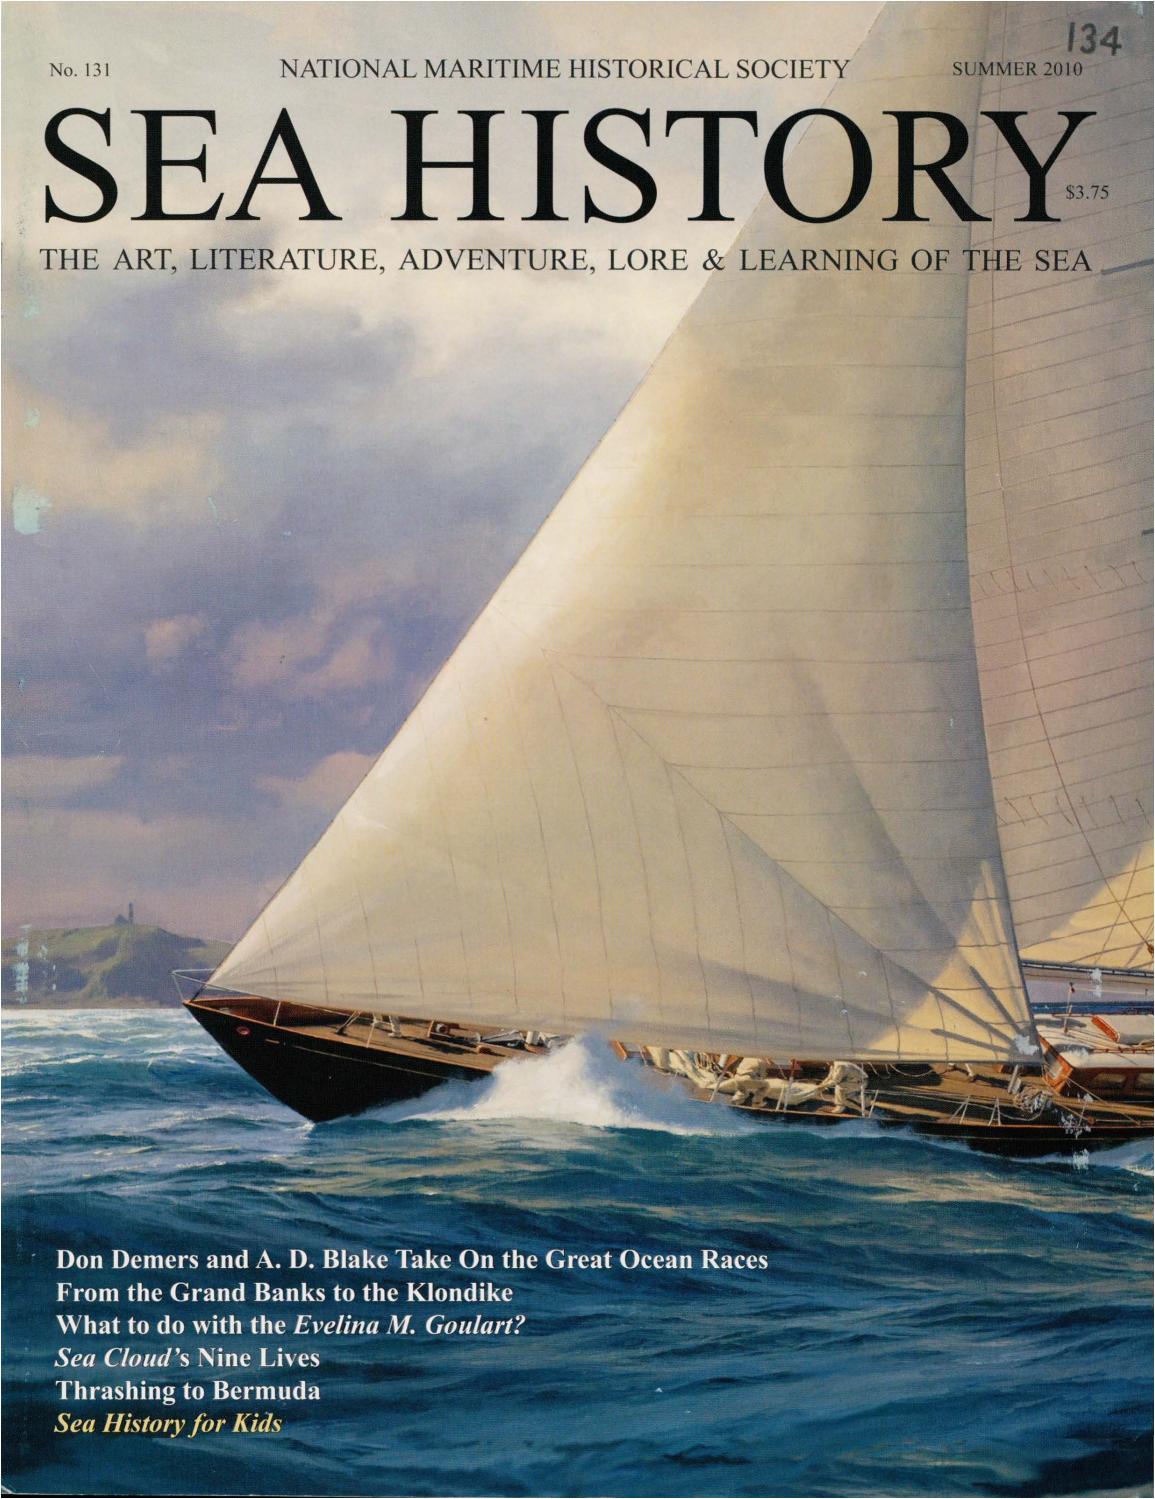 sea history 131 summer 2010 by national maritime historical society sea history magazine issuu